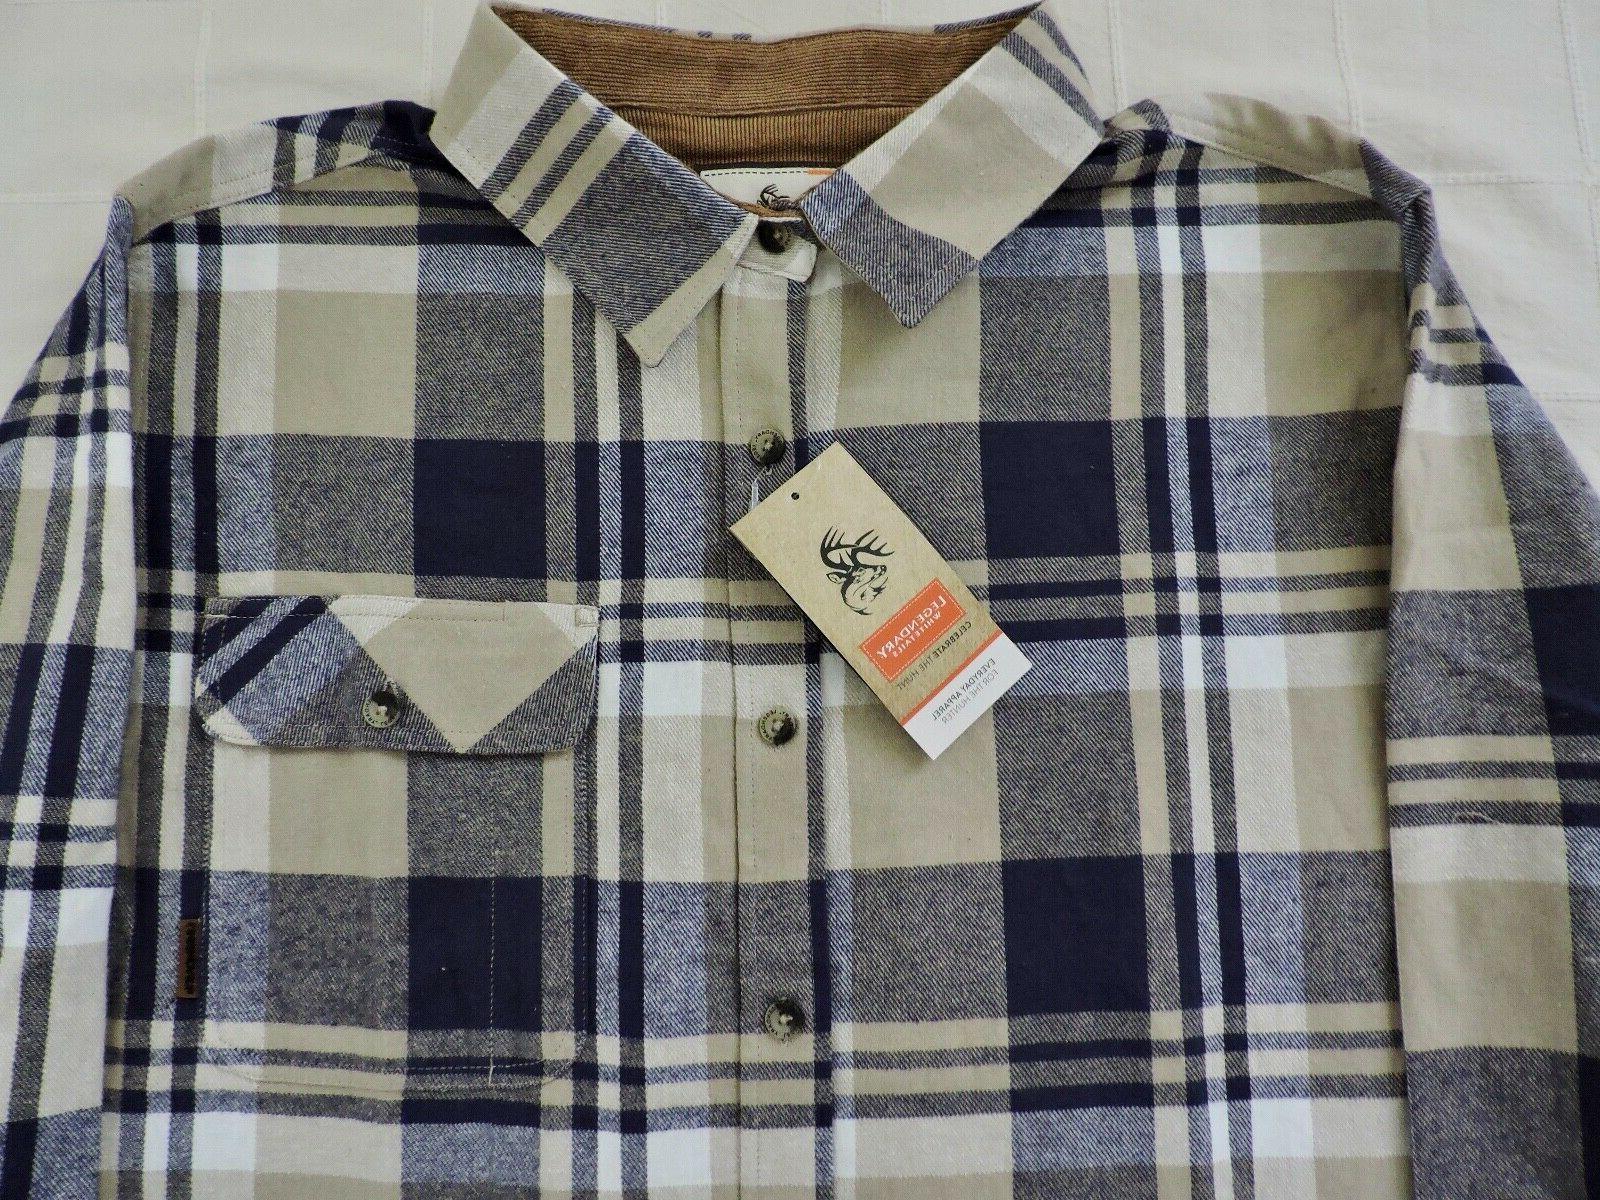 LEGENDARY WHITETAILS NWT Mens Sz Large Shale Buck Flannel Shirt